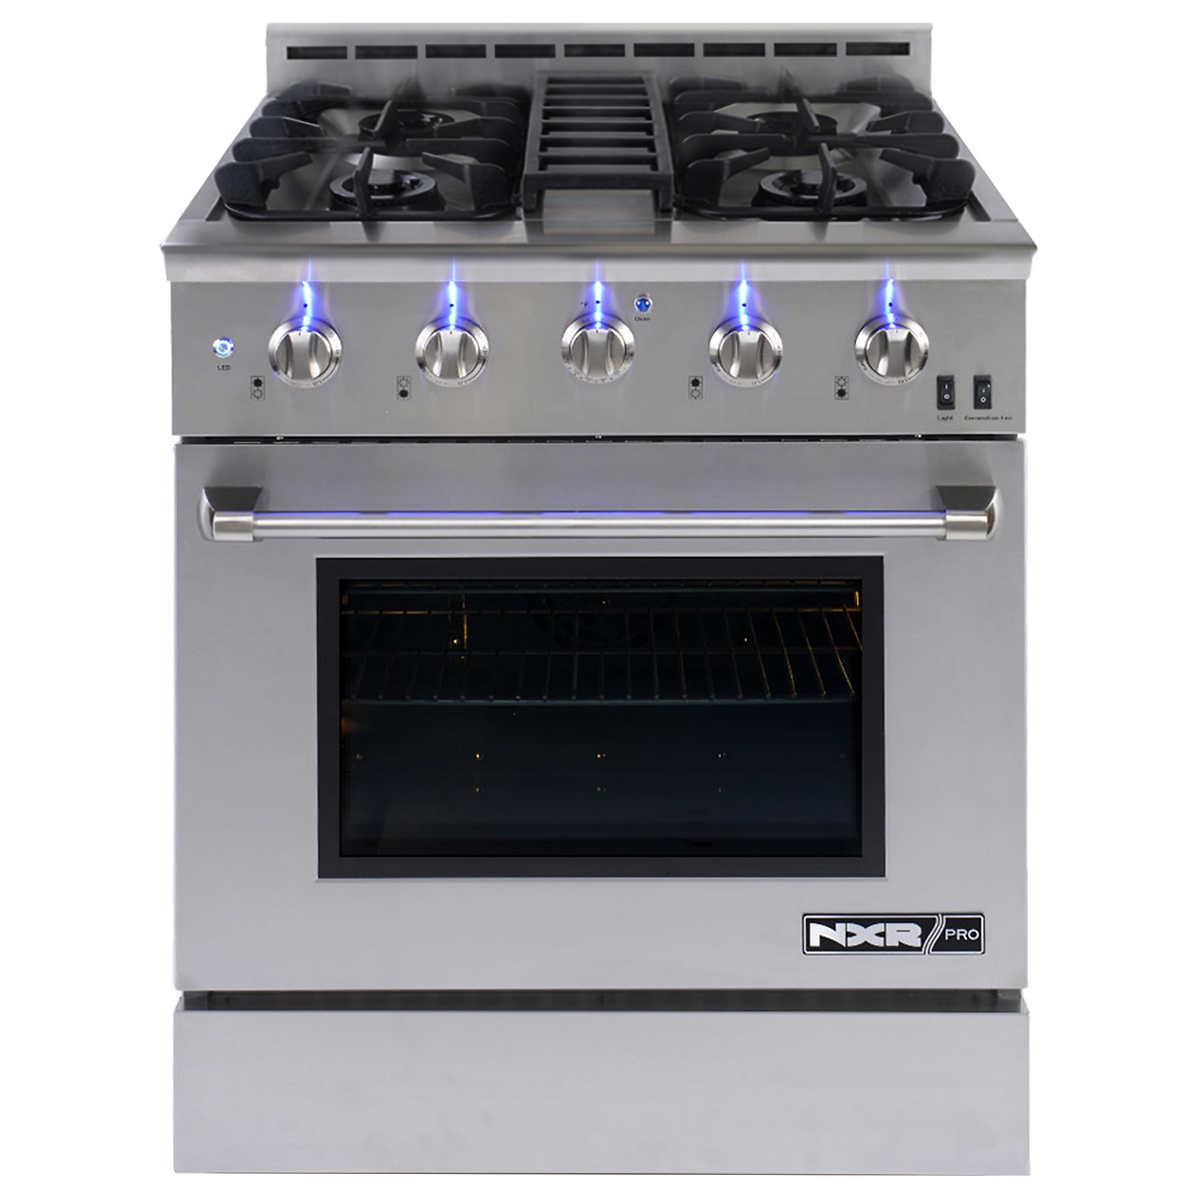 Whirlpool 5 burner gas range - Nxr Pro 30 Professional Style Gas Range In Stainless Steel Nxrpro3051